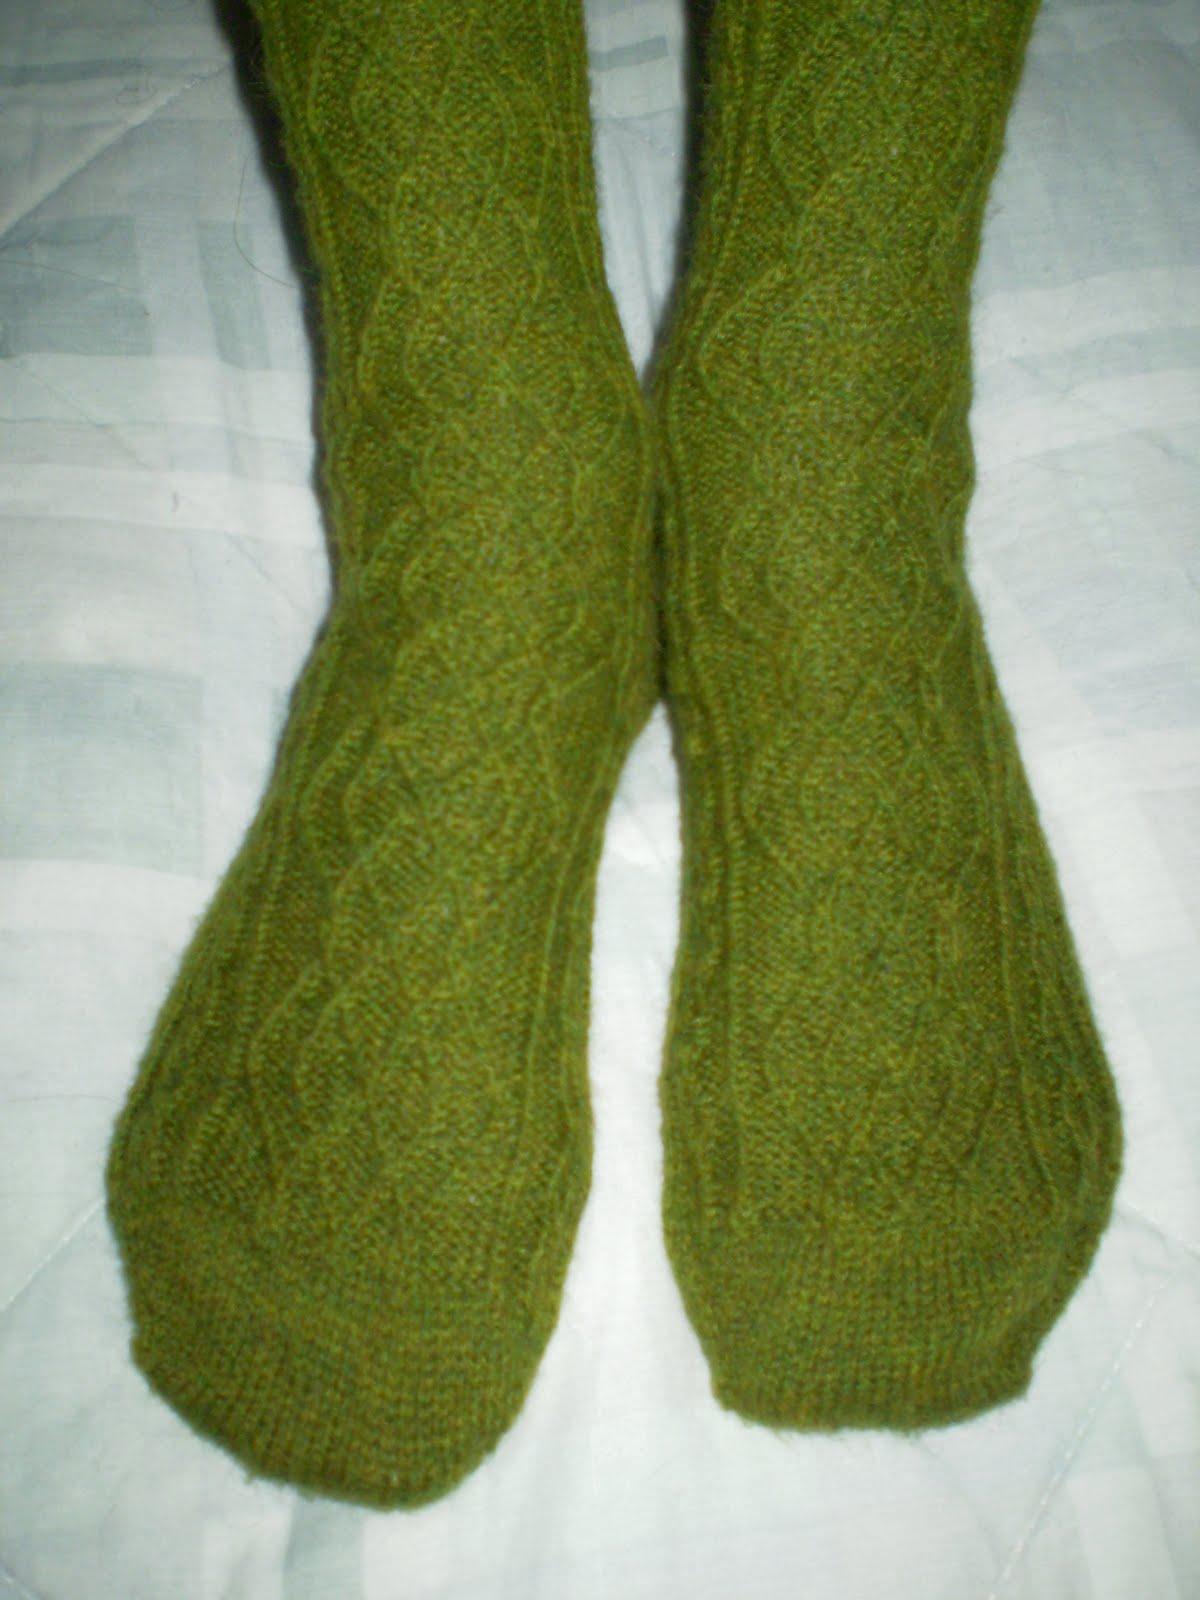 Knitting Cowgirls: Richards Aran Socks